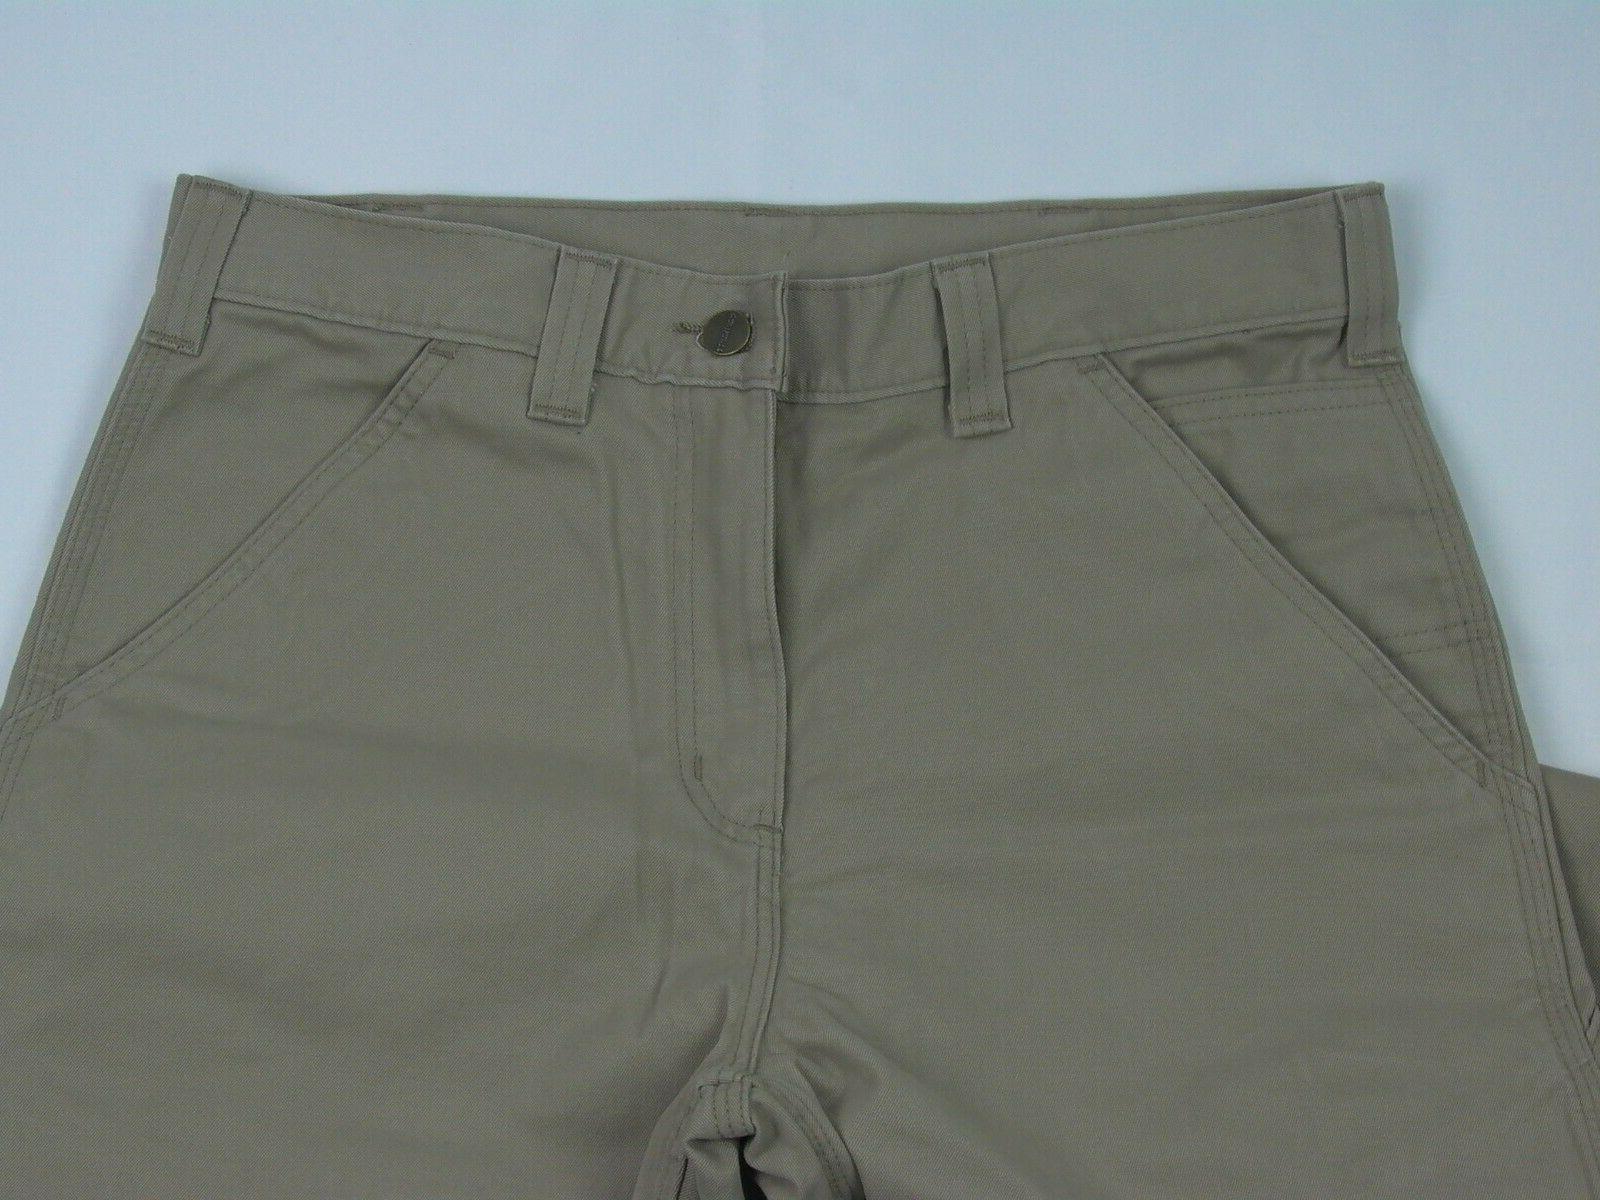 New Carhartt Men's Fit Washed Twill x Khaki Cargo Pants